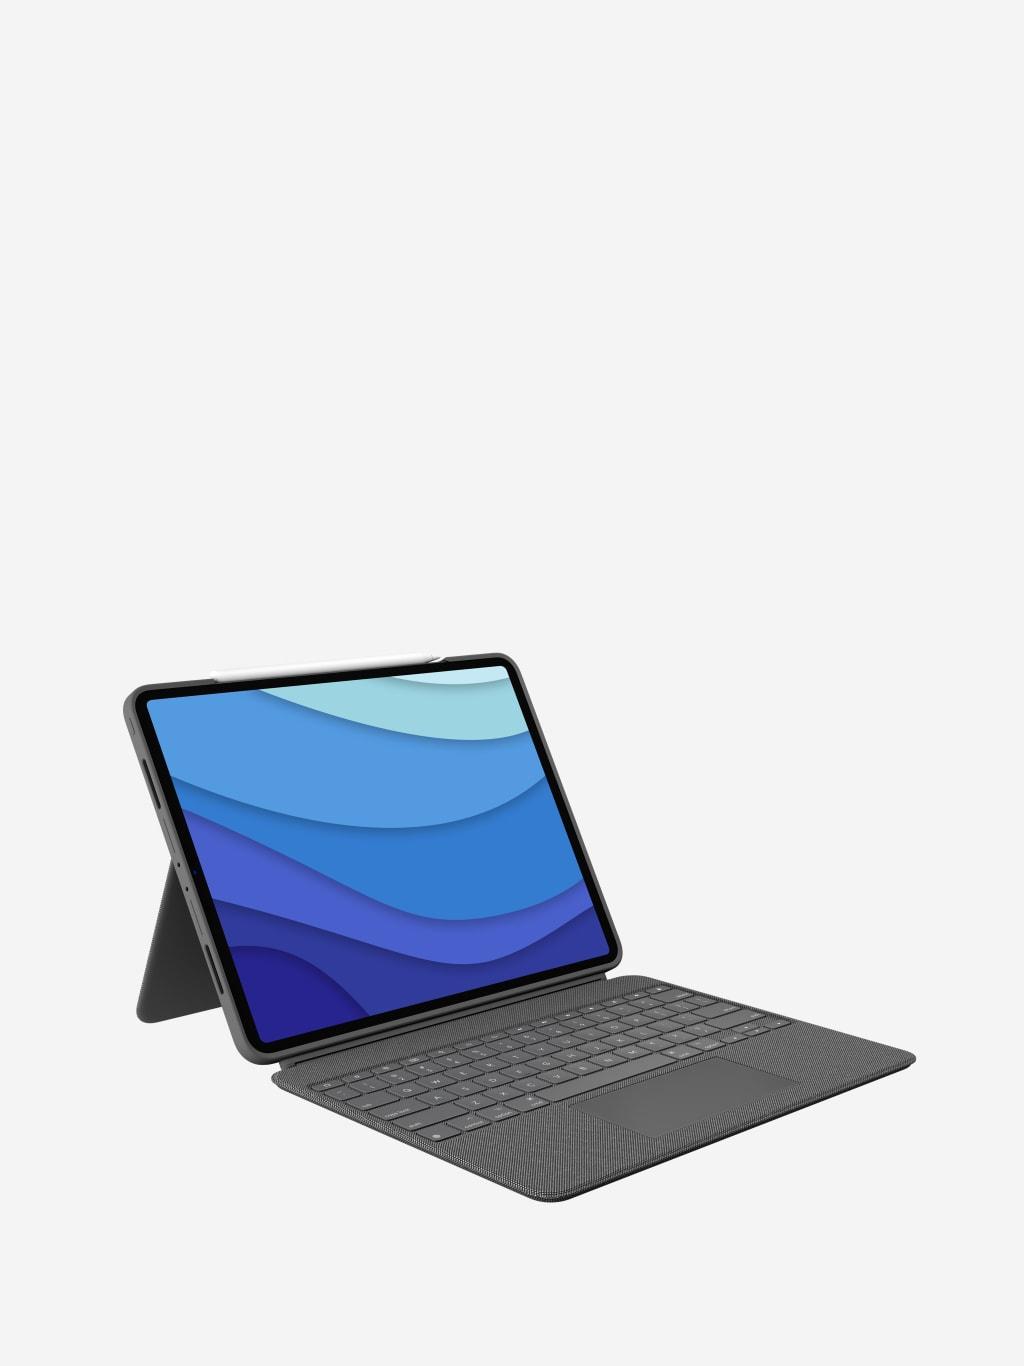 logi-combo-touch-hero-tablet